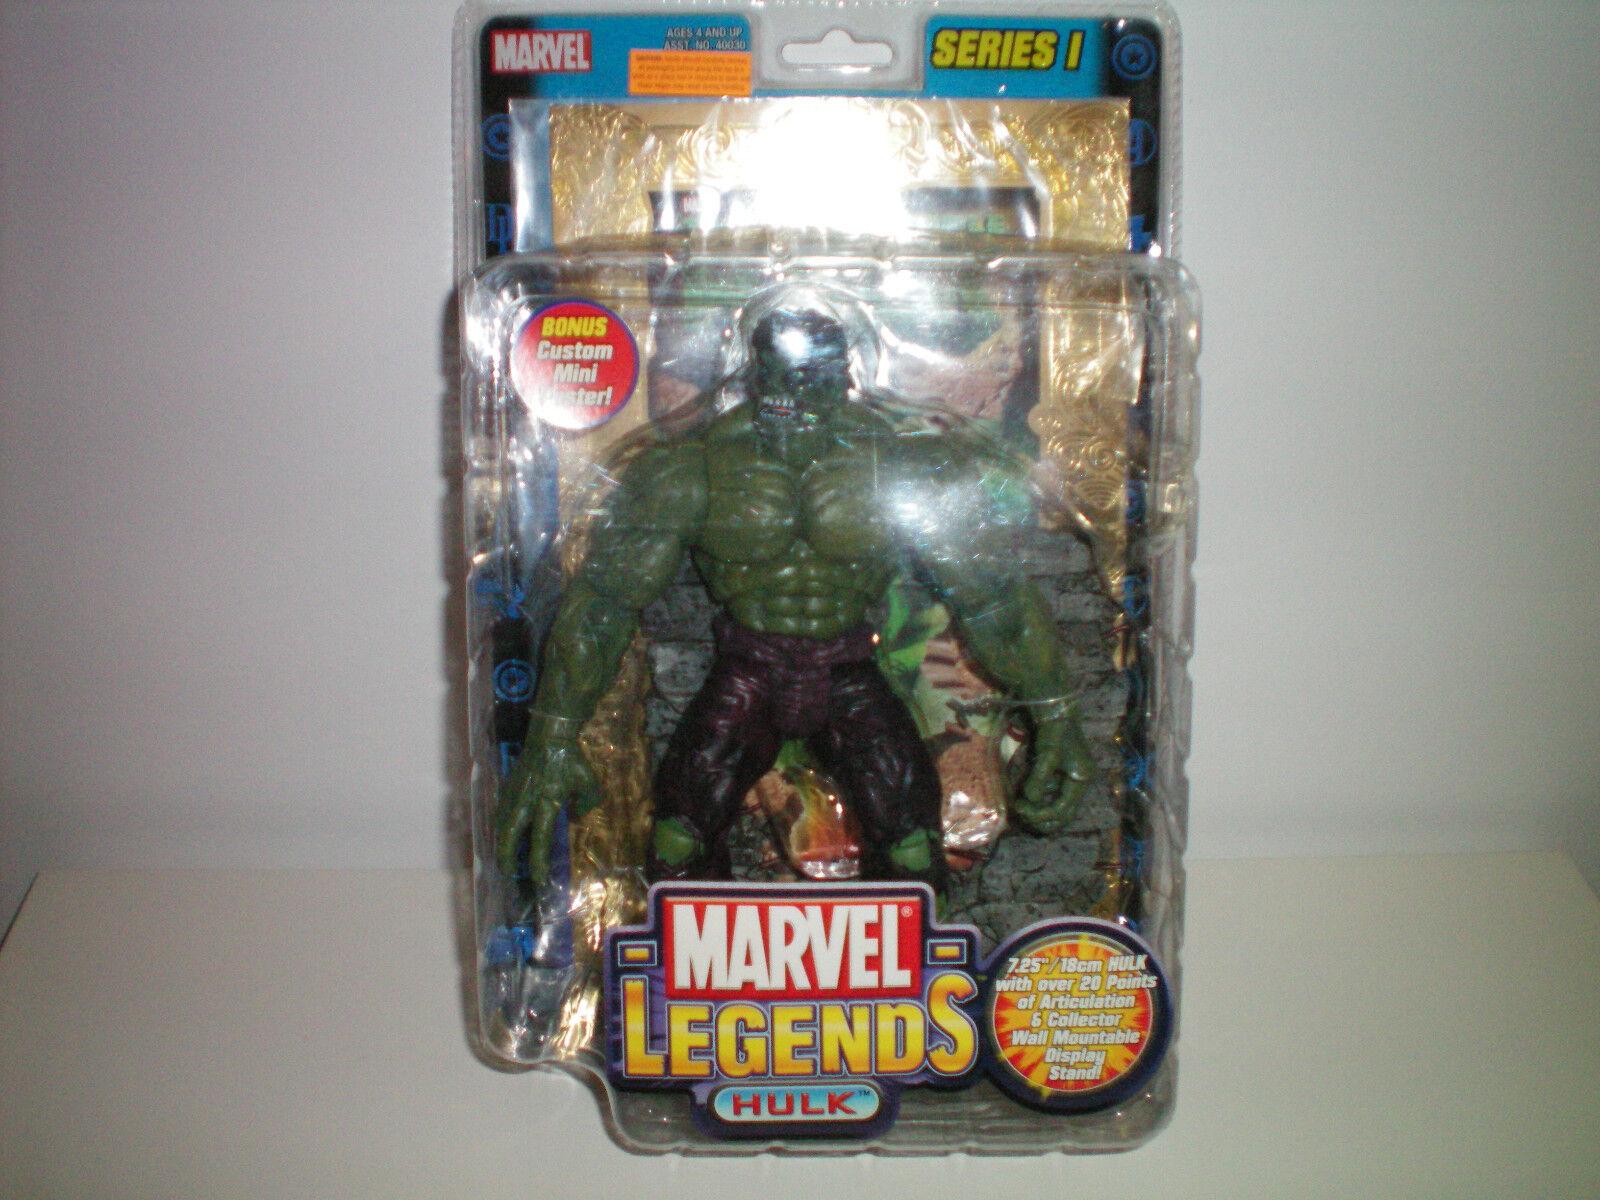 Marvel - legenden hulk Gold card variante abbildung reihe 1 avengers neue (alter ultron